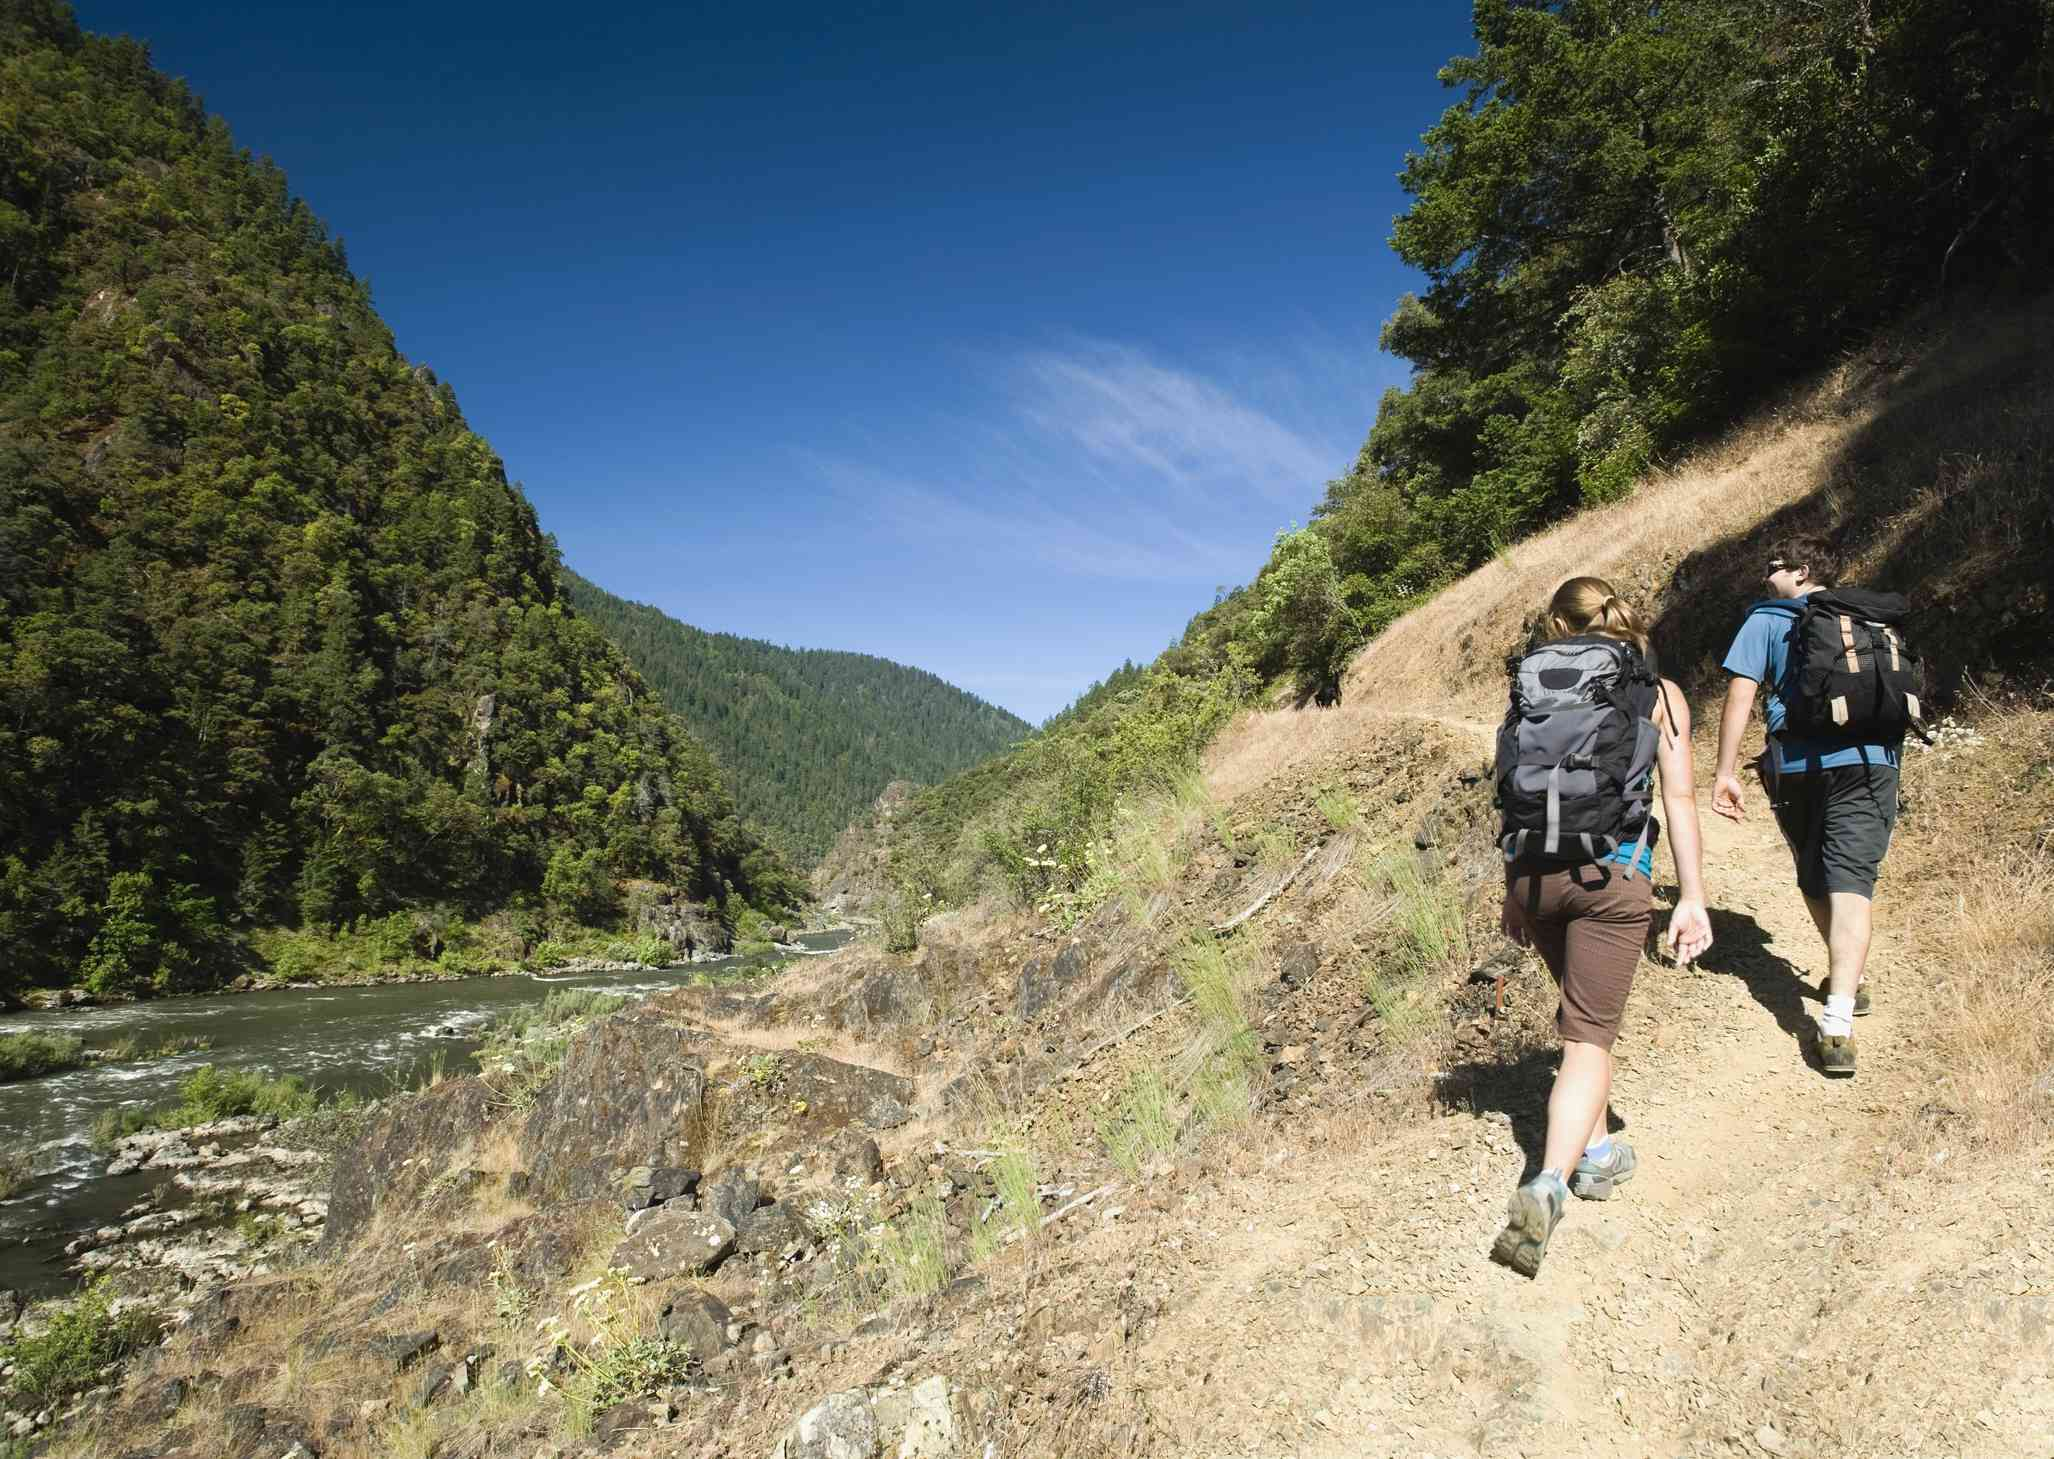 Hikers walking on riverside trail